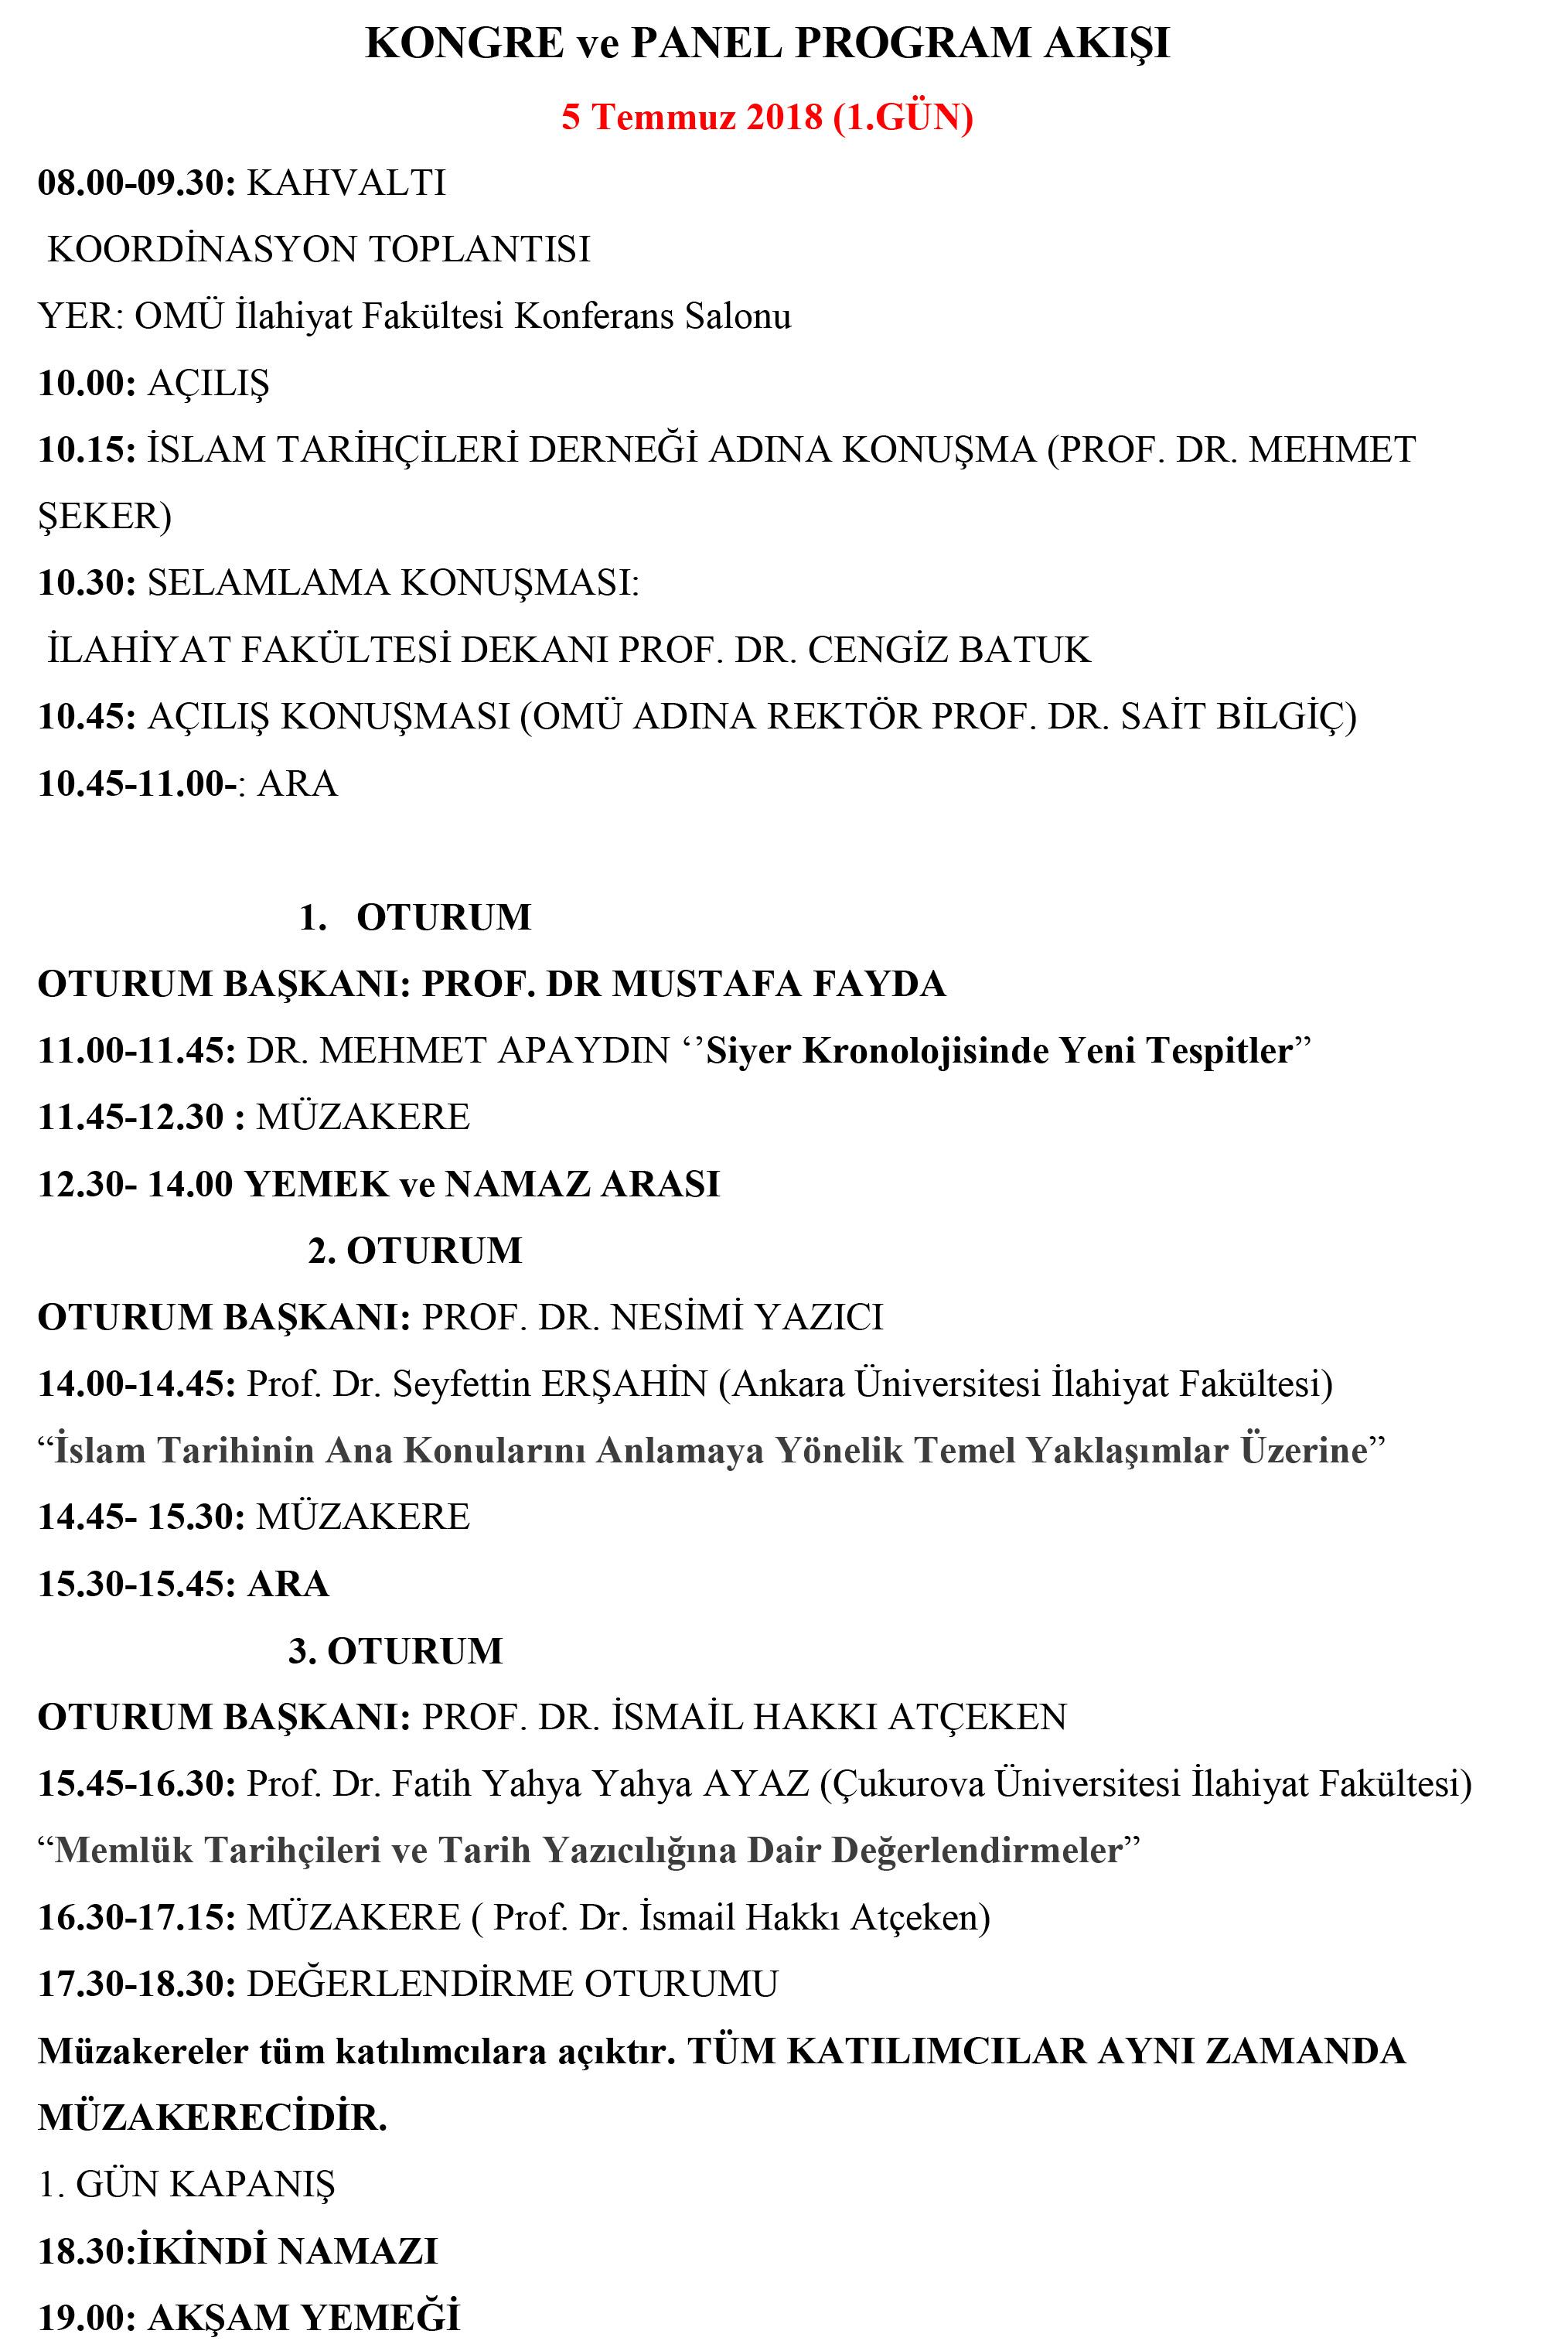 http://www.omu.edu.tr/sites/default/files/omu_islam_tarihinde_darbeler_kongre_program_akisi-1.jpg